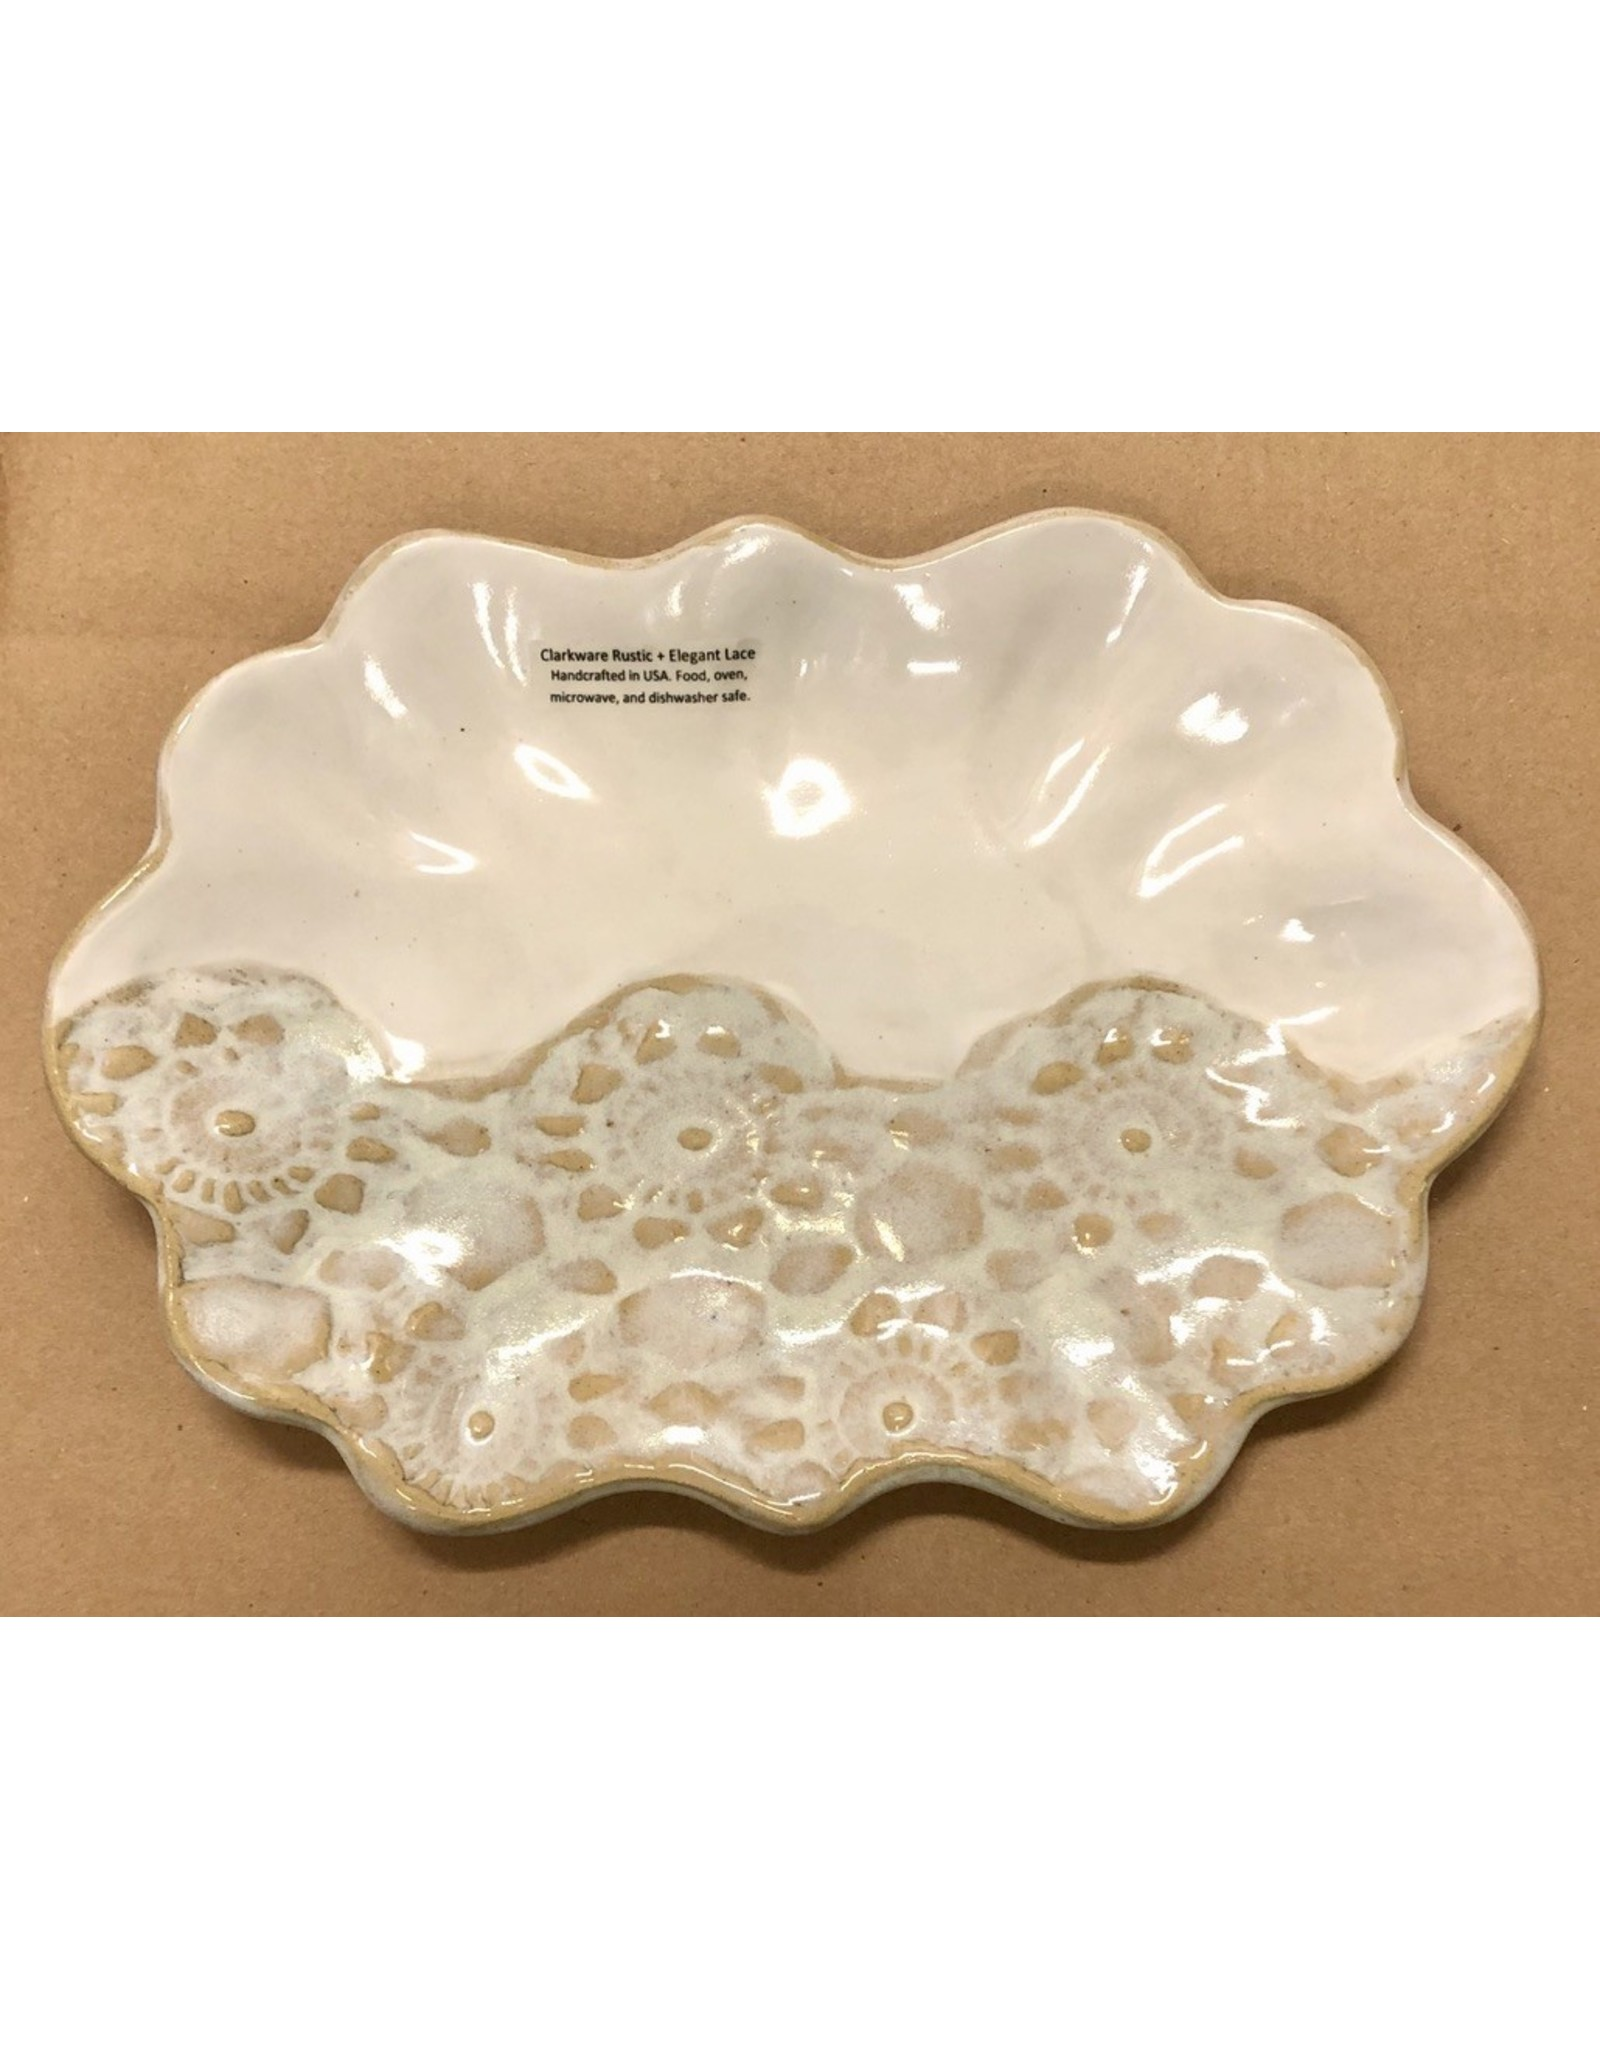 Clarkware Pottery SCALLOP TRAY